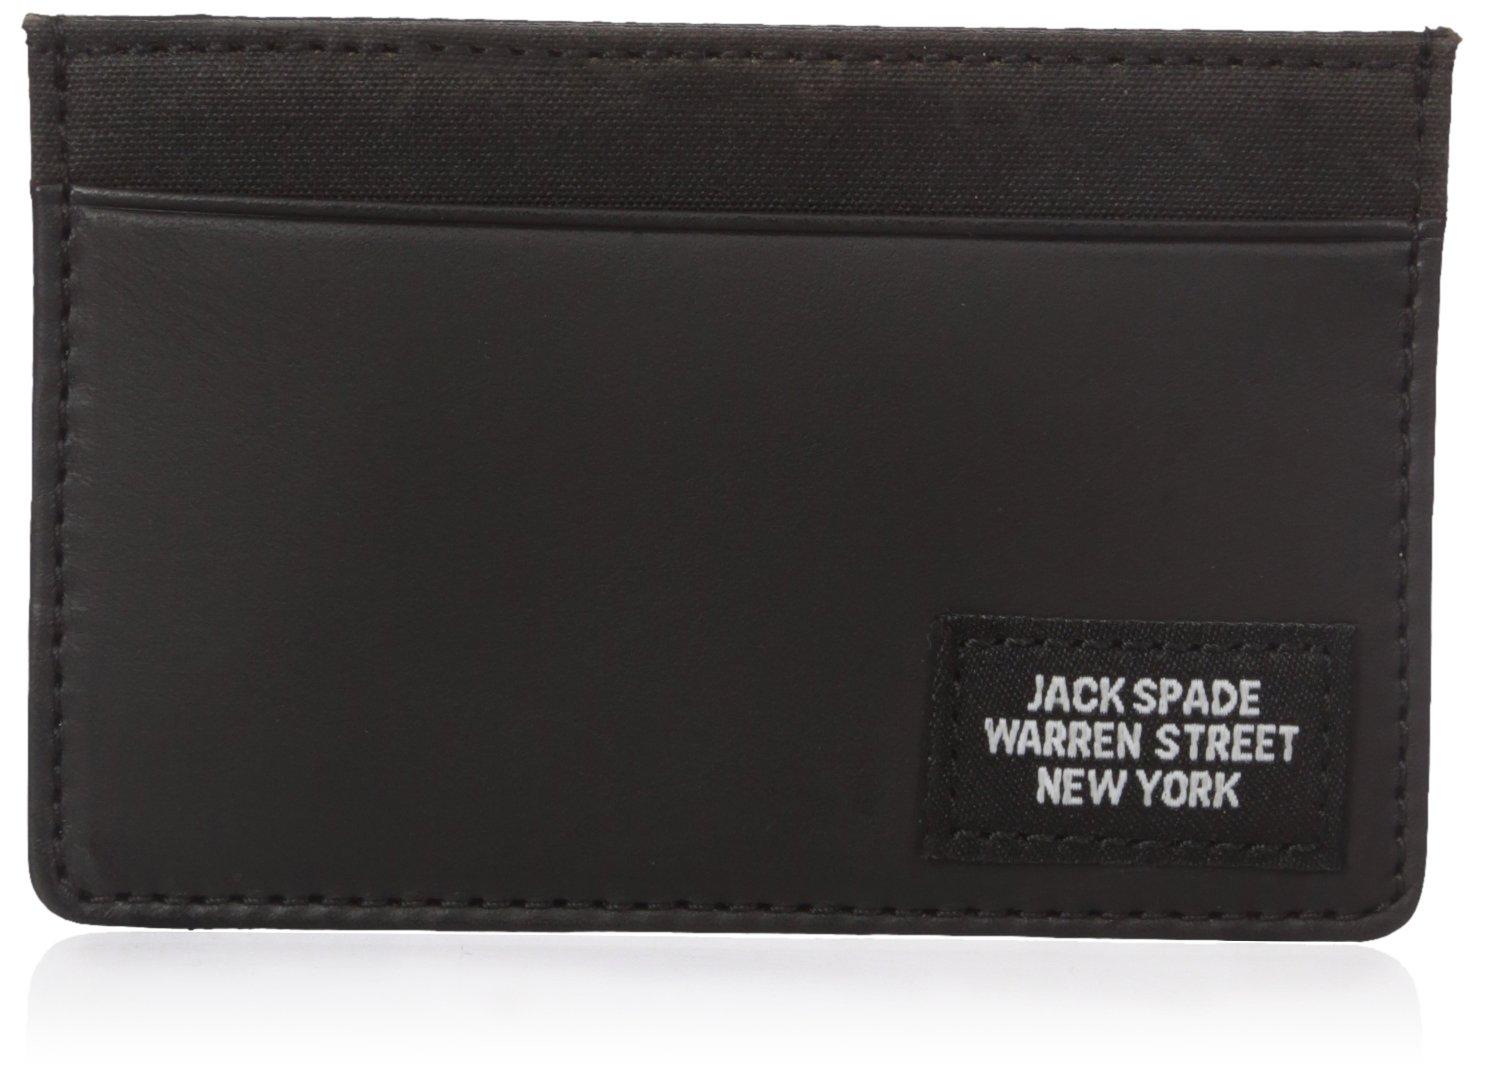 Jack Spade Men's Waxwear Credit Card Holder by Jack Spade (Image #1)